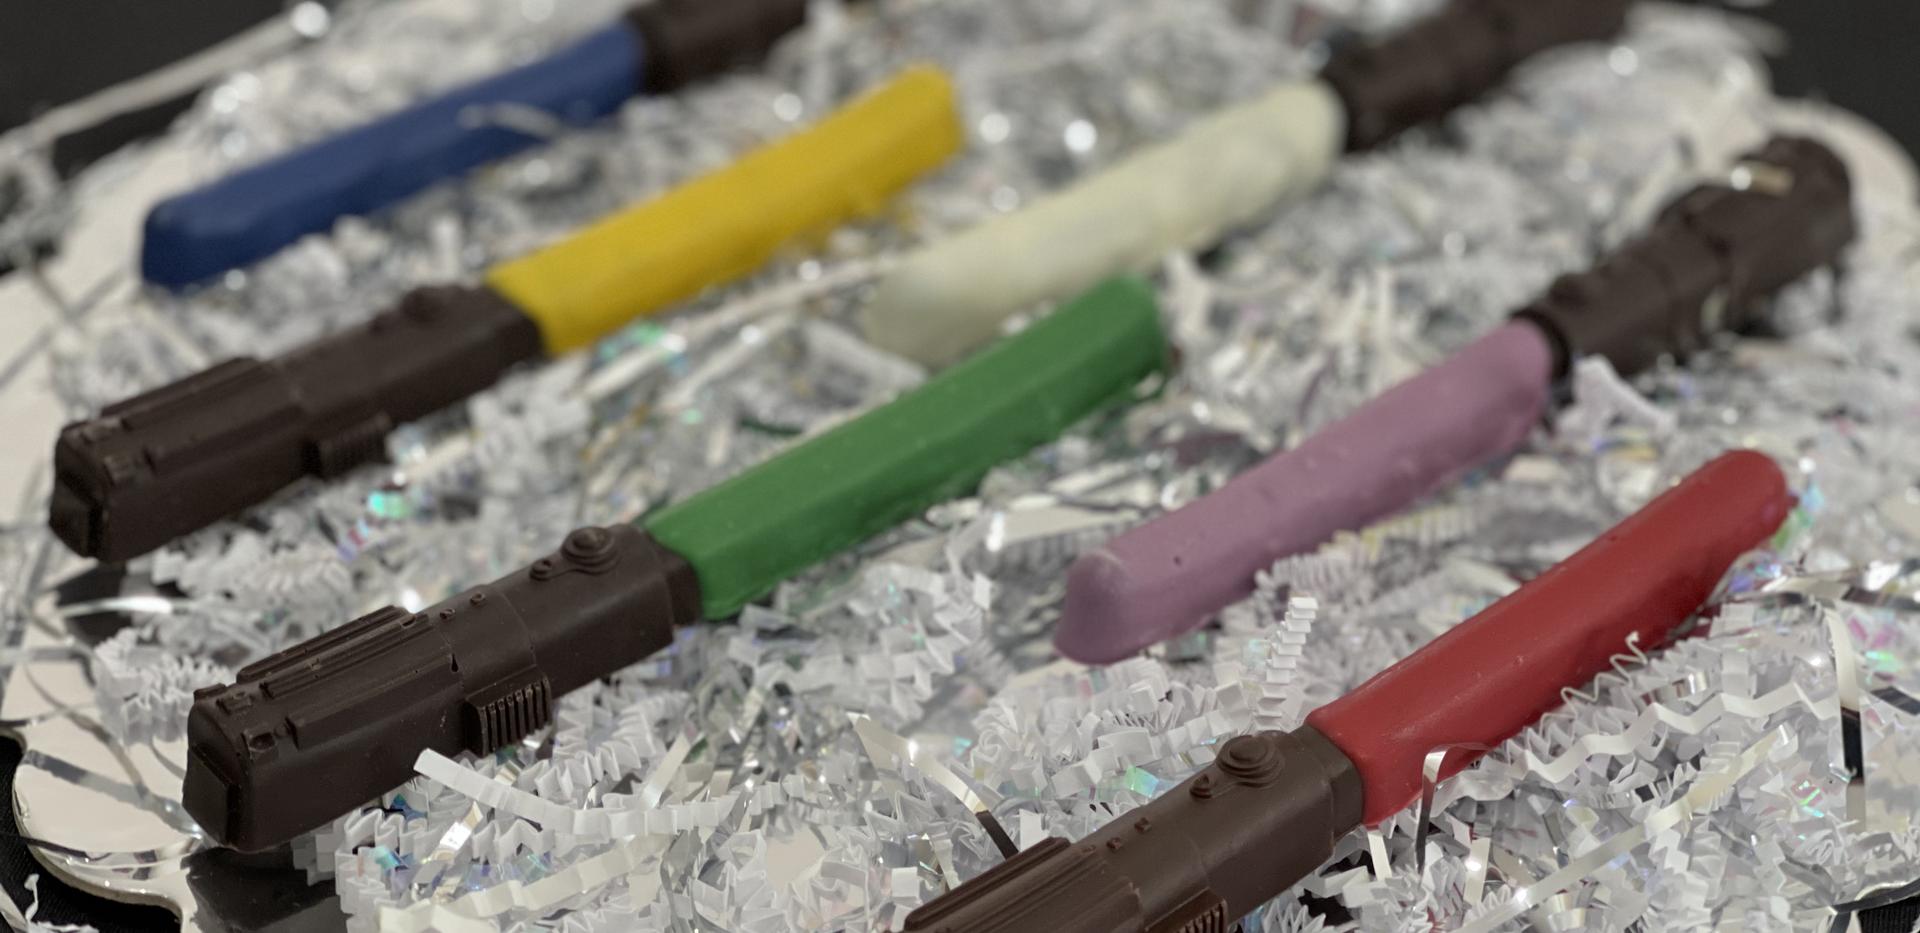 Star Wars Chocolate Lightsabers | $18